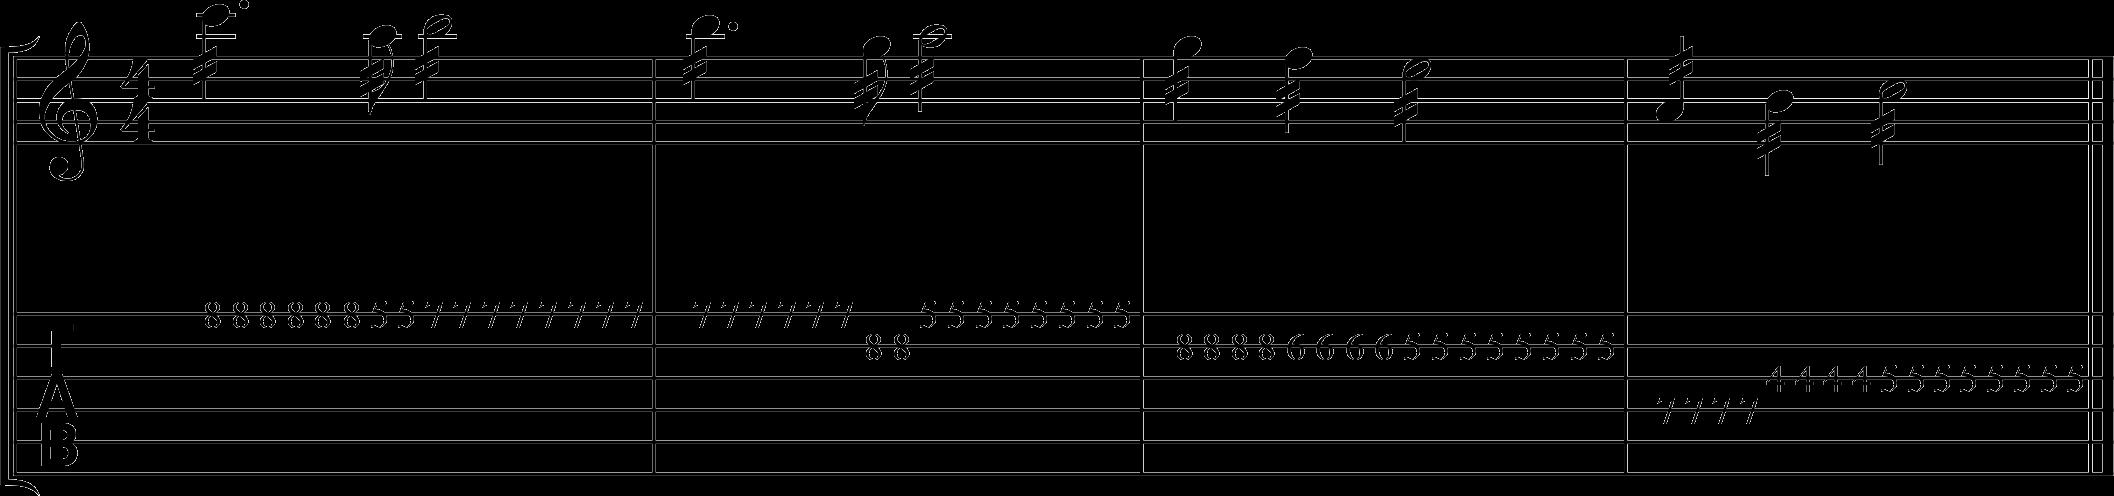 吉他颤音(tremolo)拨弦-简介